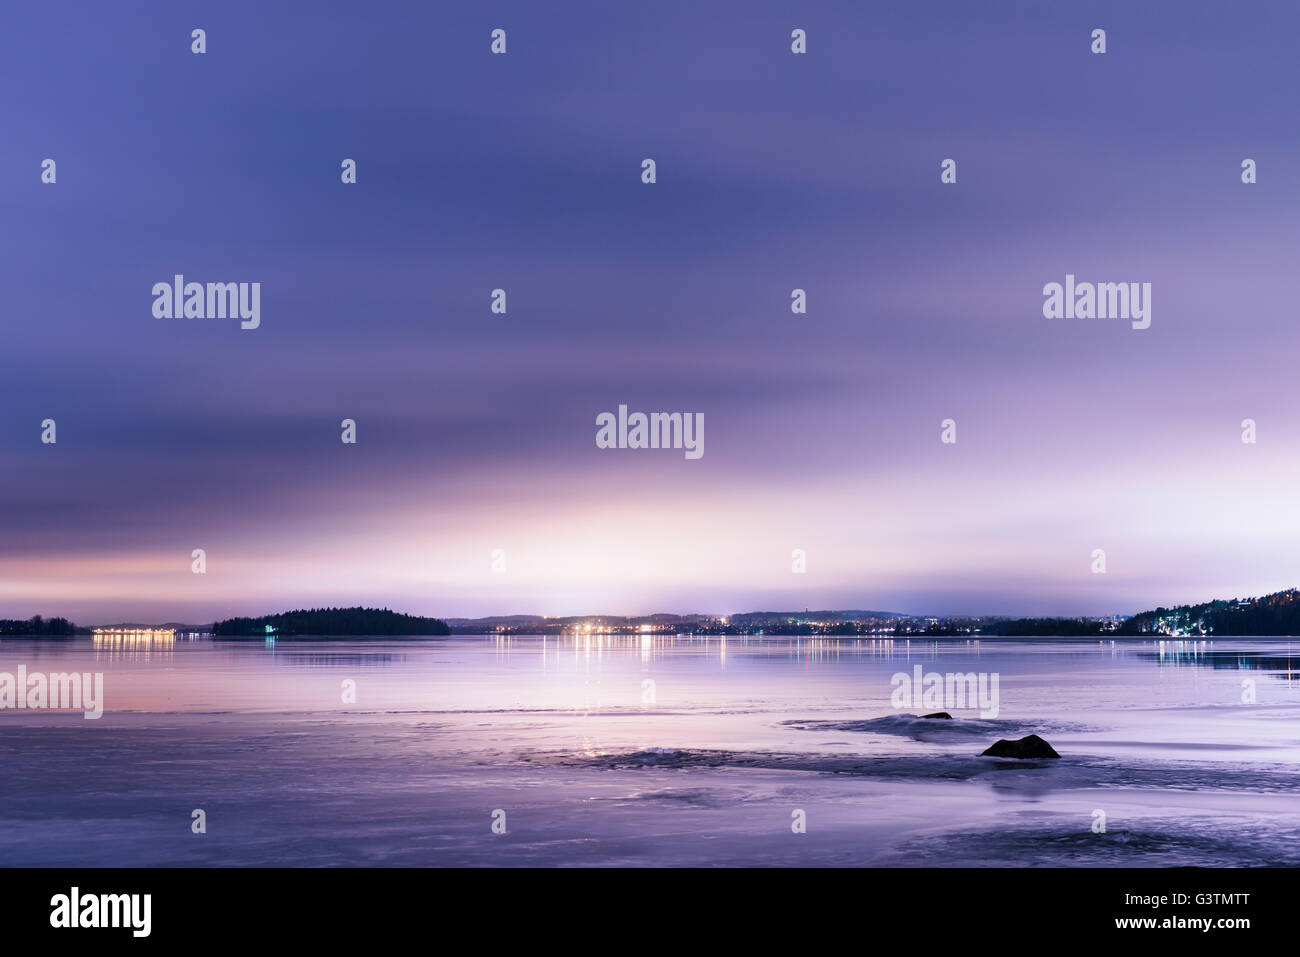 Finland, Pirkanmaa, Tampere, Pyhajarvi, Lake under purple sky at dusk - Stock Image